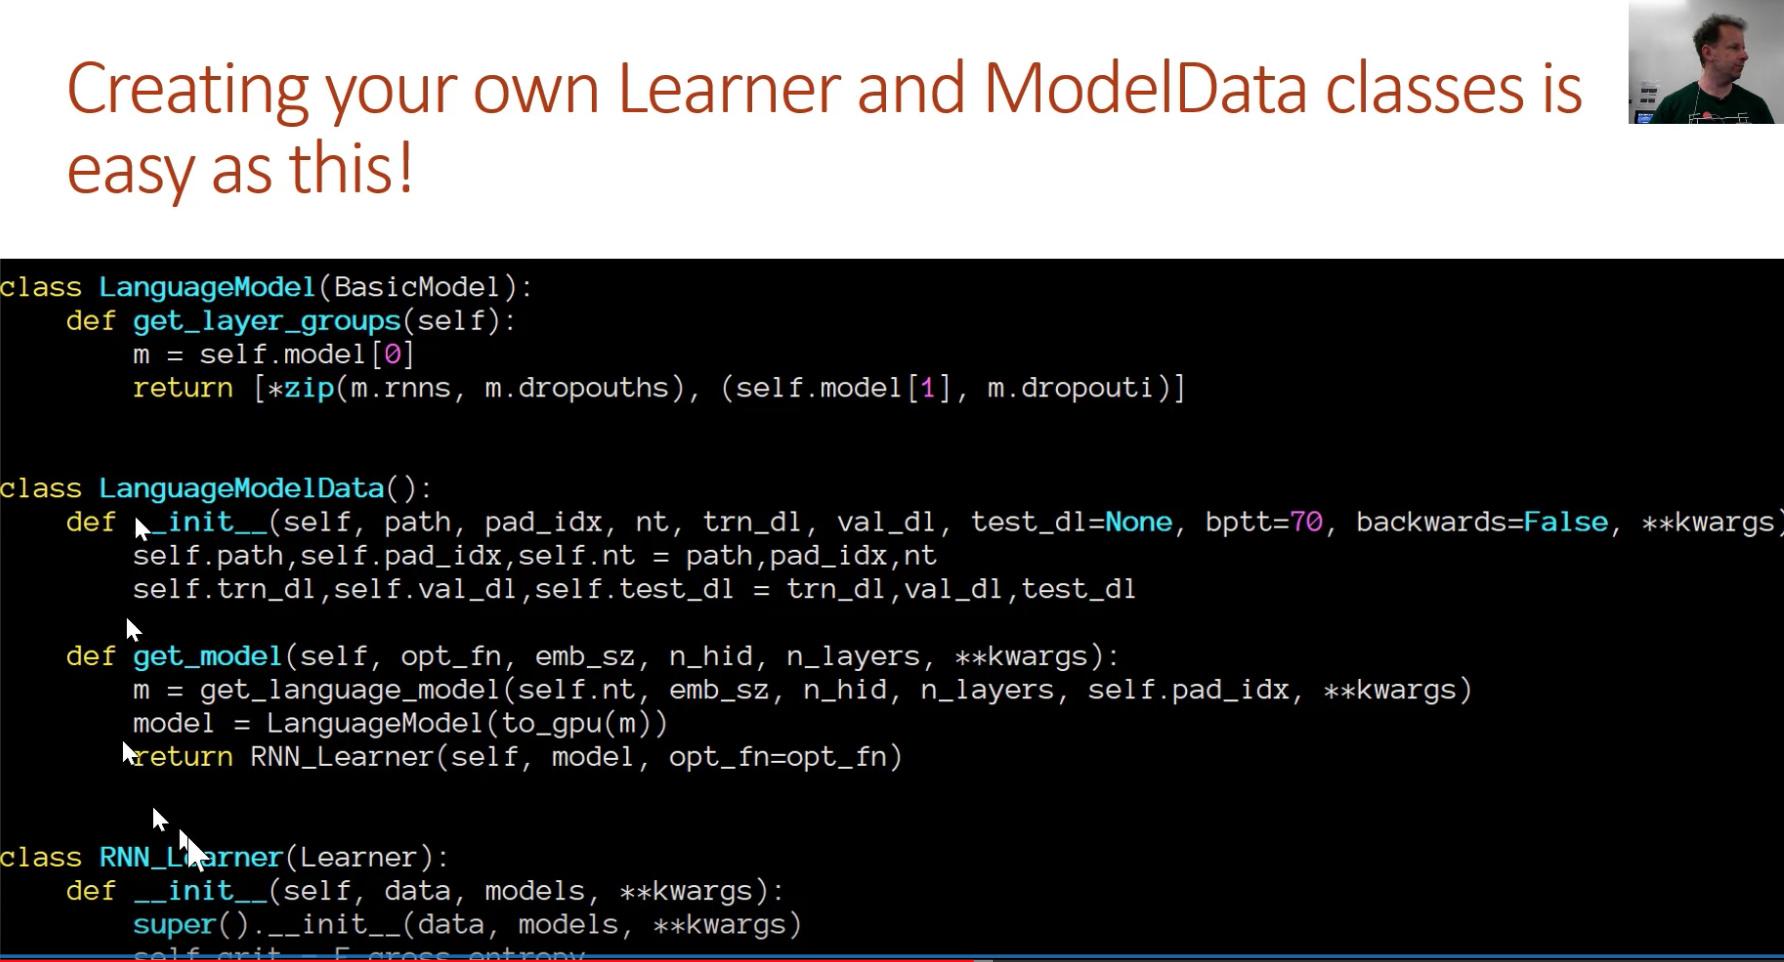 DeepLearning-Lec10-Notes - Part 2 & Alumni (2018) - Deep Learning